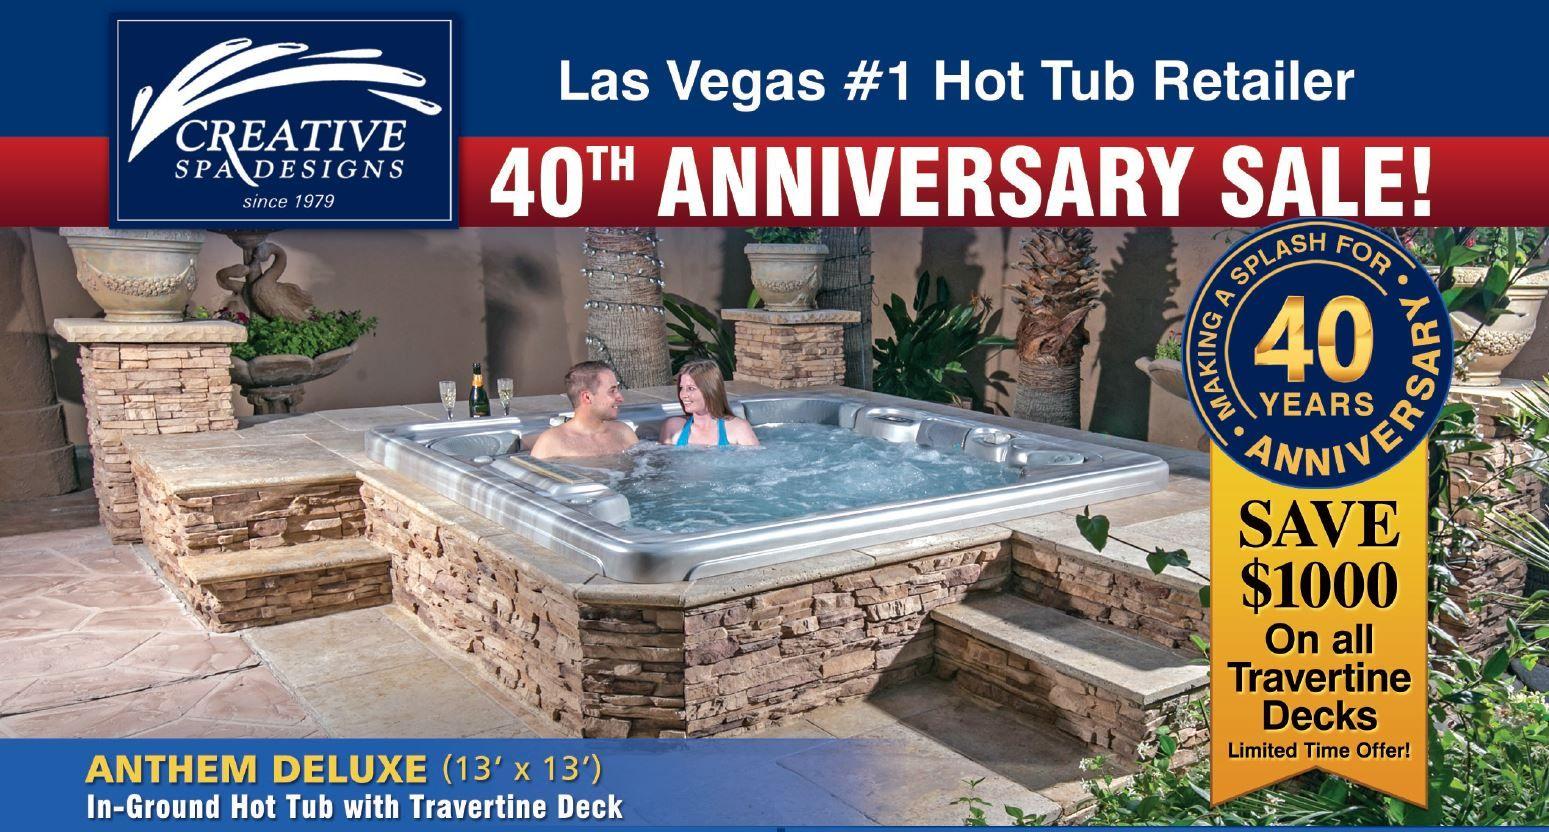 Come Make A Splash With Las Vegas 1 Hot Tub Retailer And